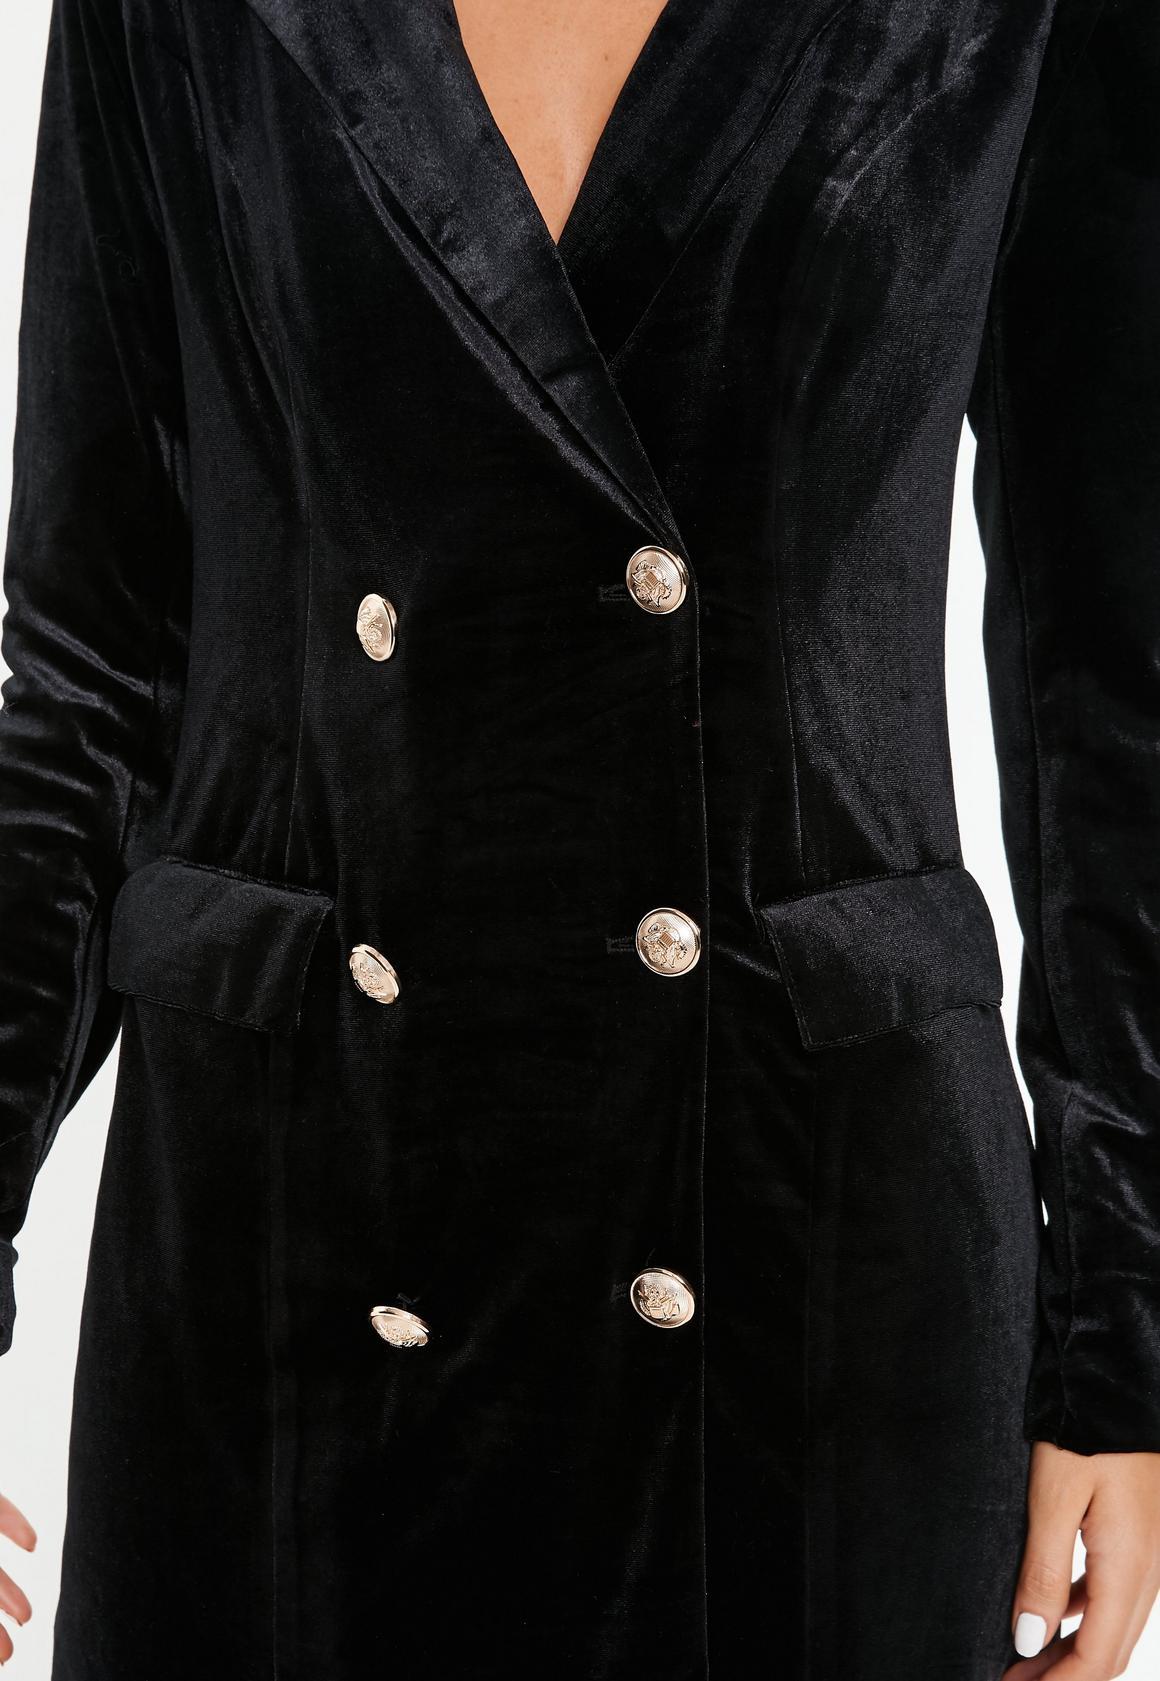 Missguided - robe-blazer en velours e à boutons dorés tall - 4